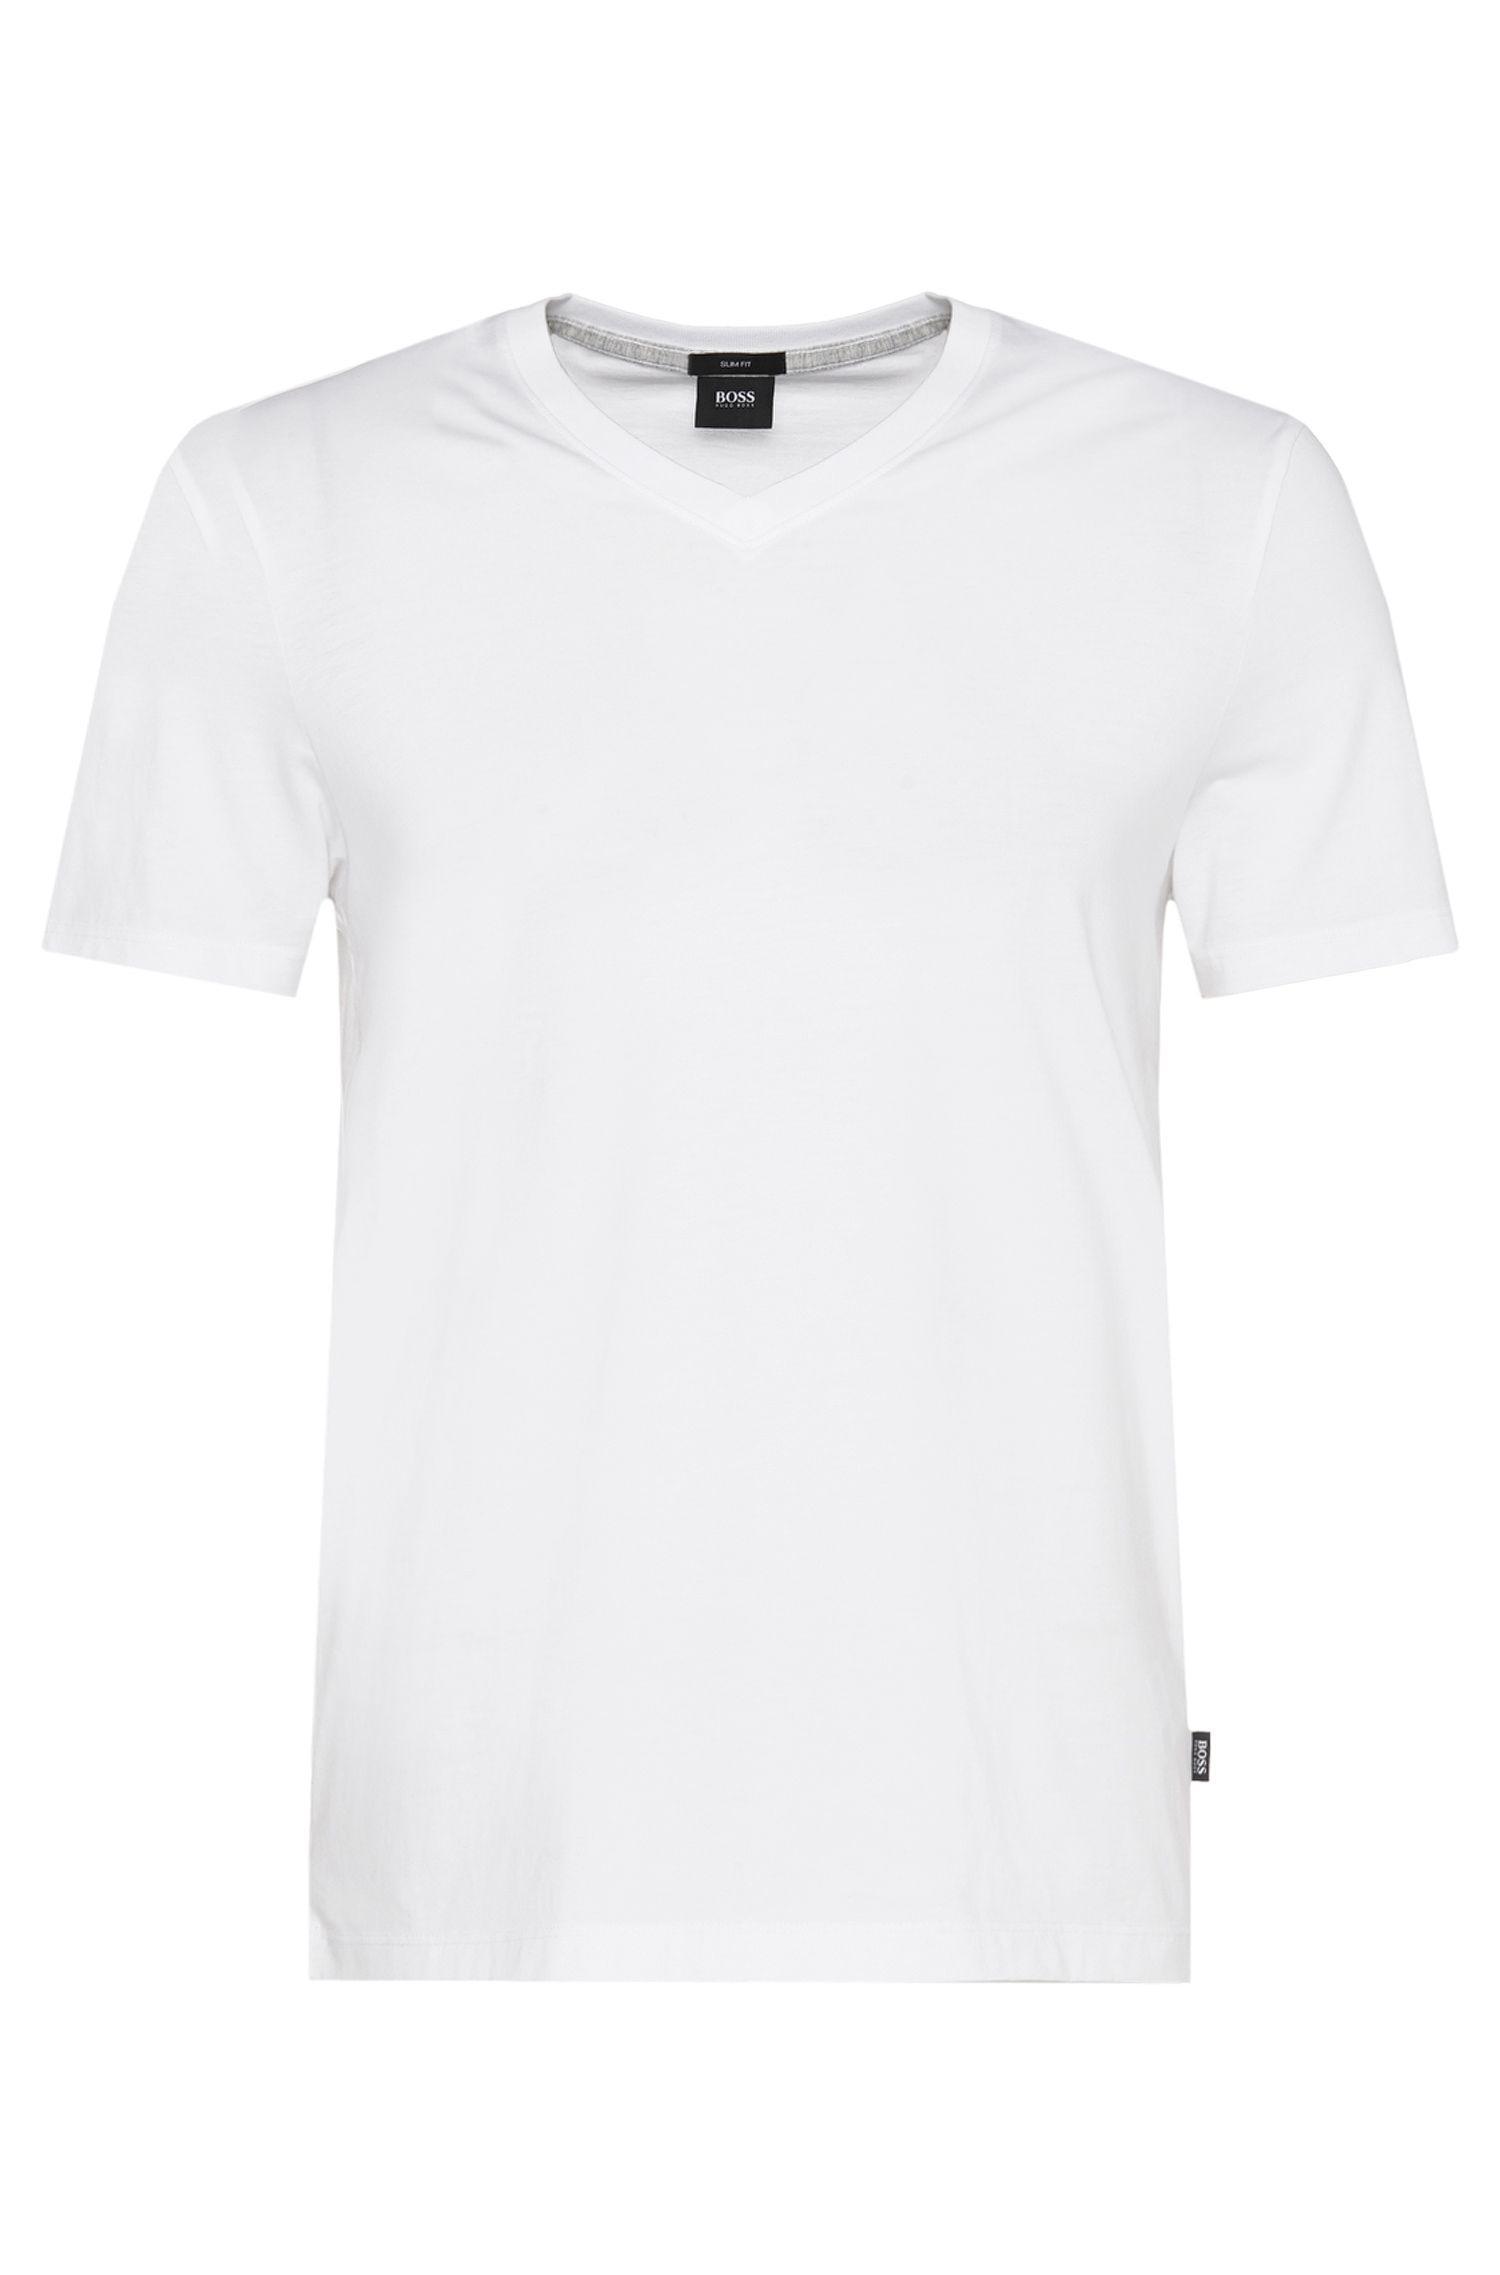 Slim-Fit T-Shirt aus Baumwolle: 'Teal 01'